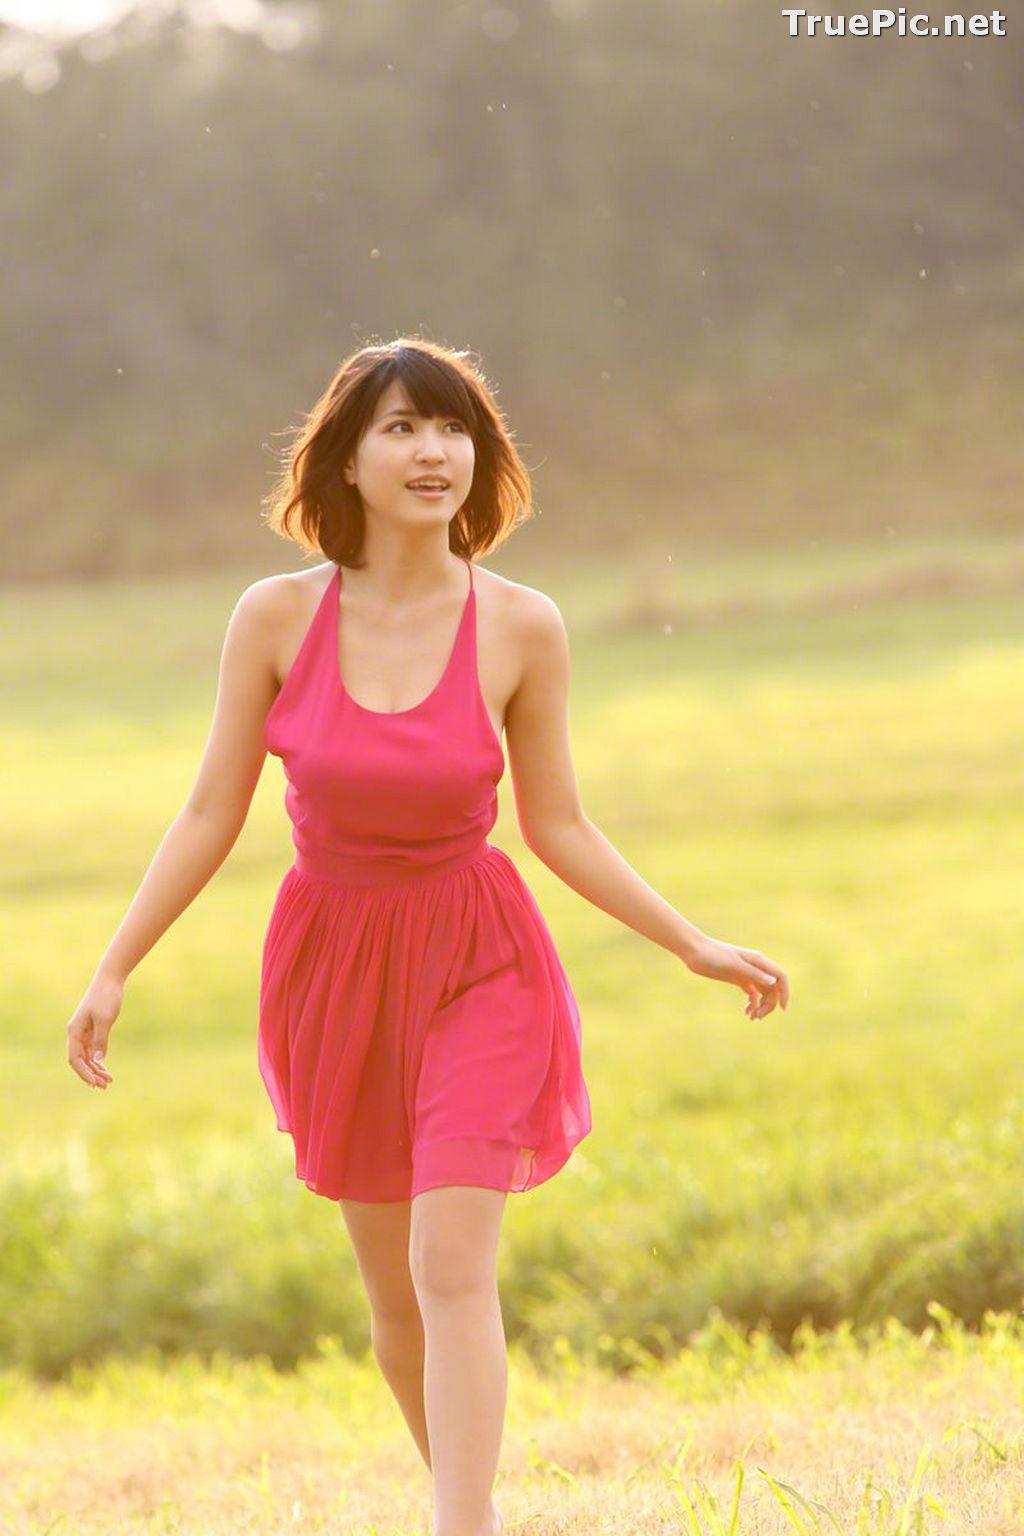 Image Wanibooks NO.122 - Japanese Gravure Idol and Actress - Asuka Kishi - TruePic.net - Picture-2